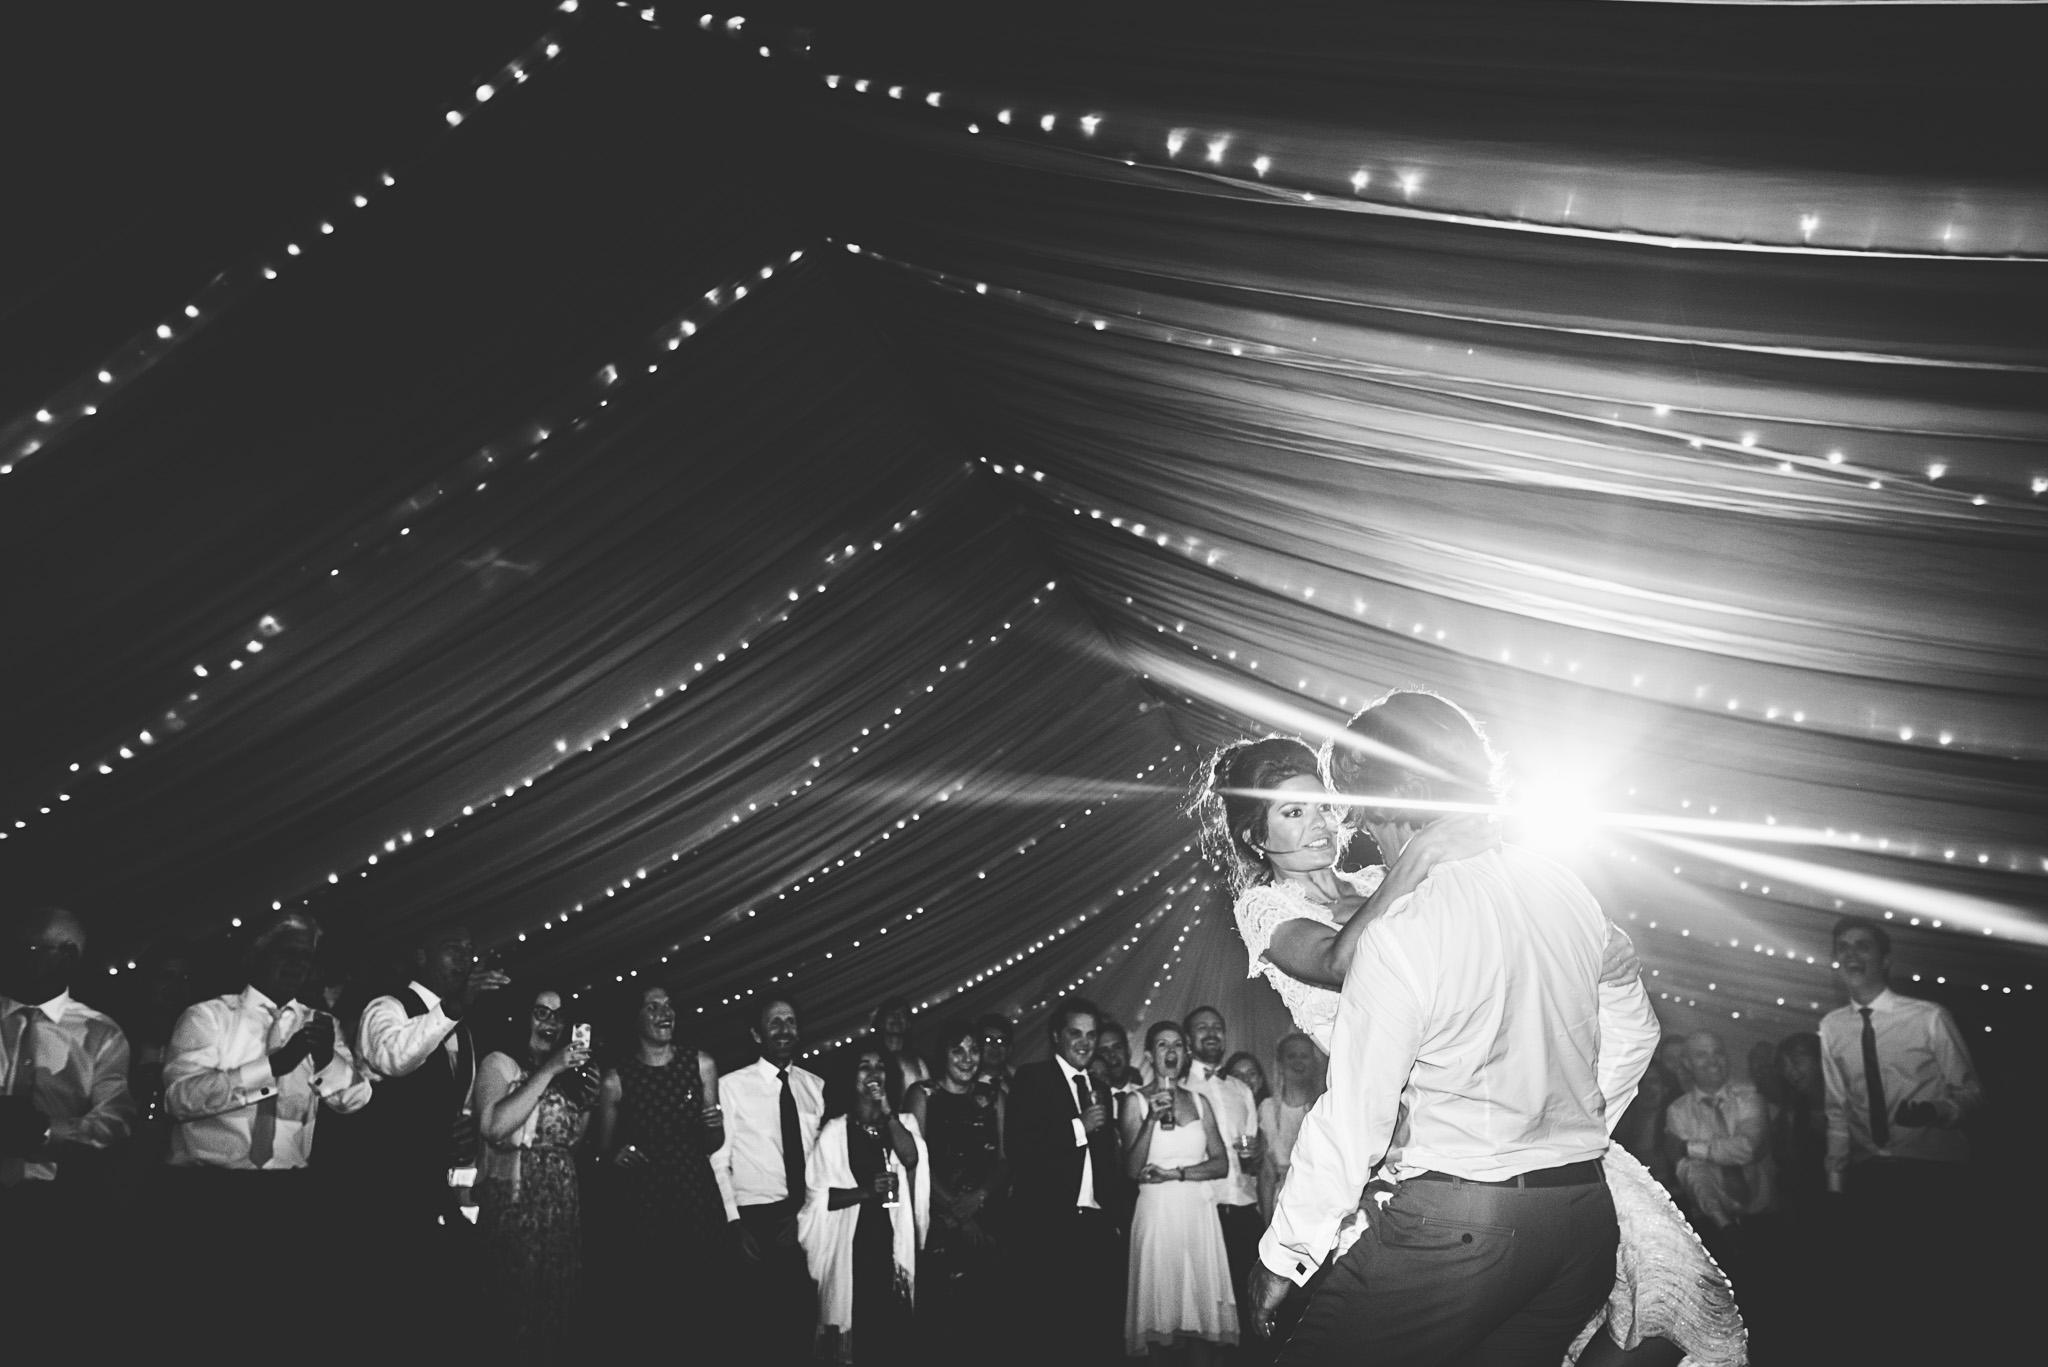 Lara & Jack Wedding 220815 by Barney Walters_1065_BW2_1116